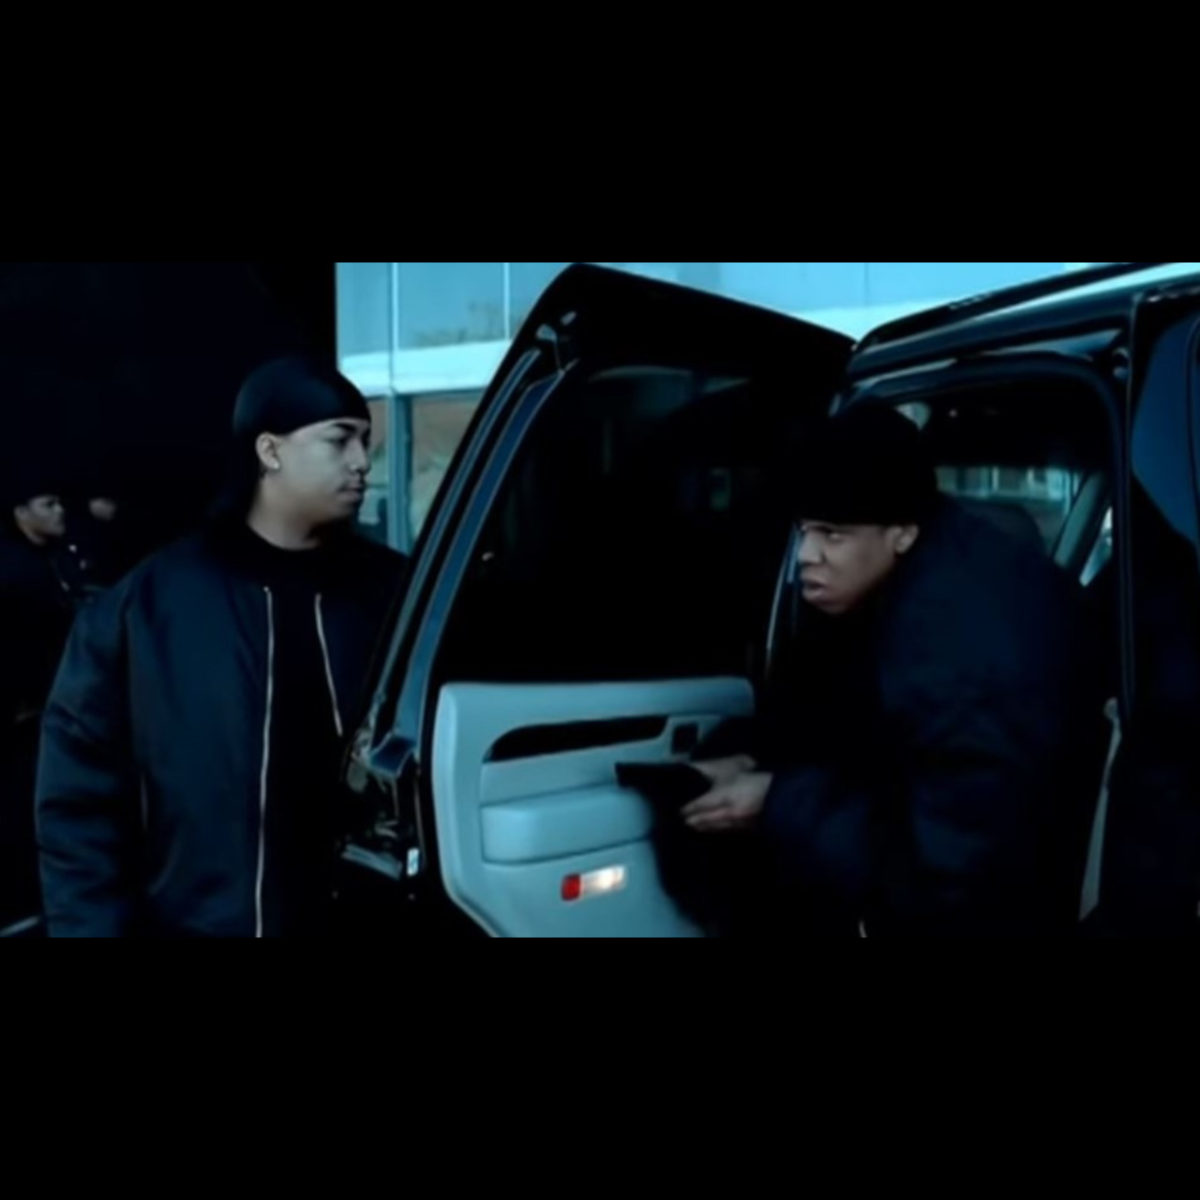 Jay-Z - Dirt Off Your Shoulder (Thumbnail)